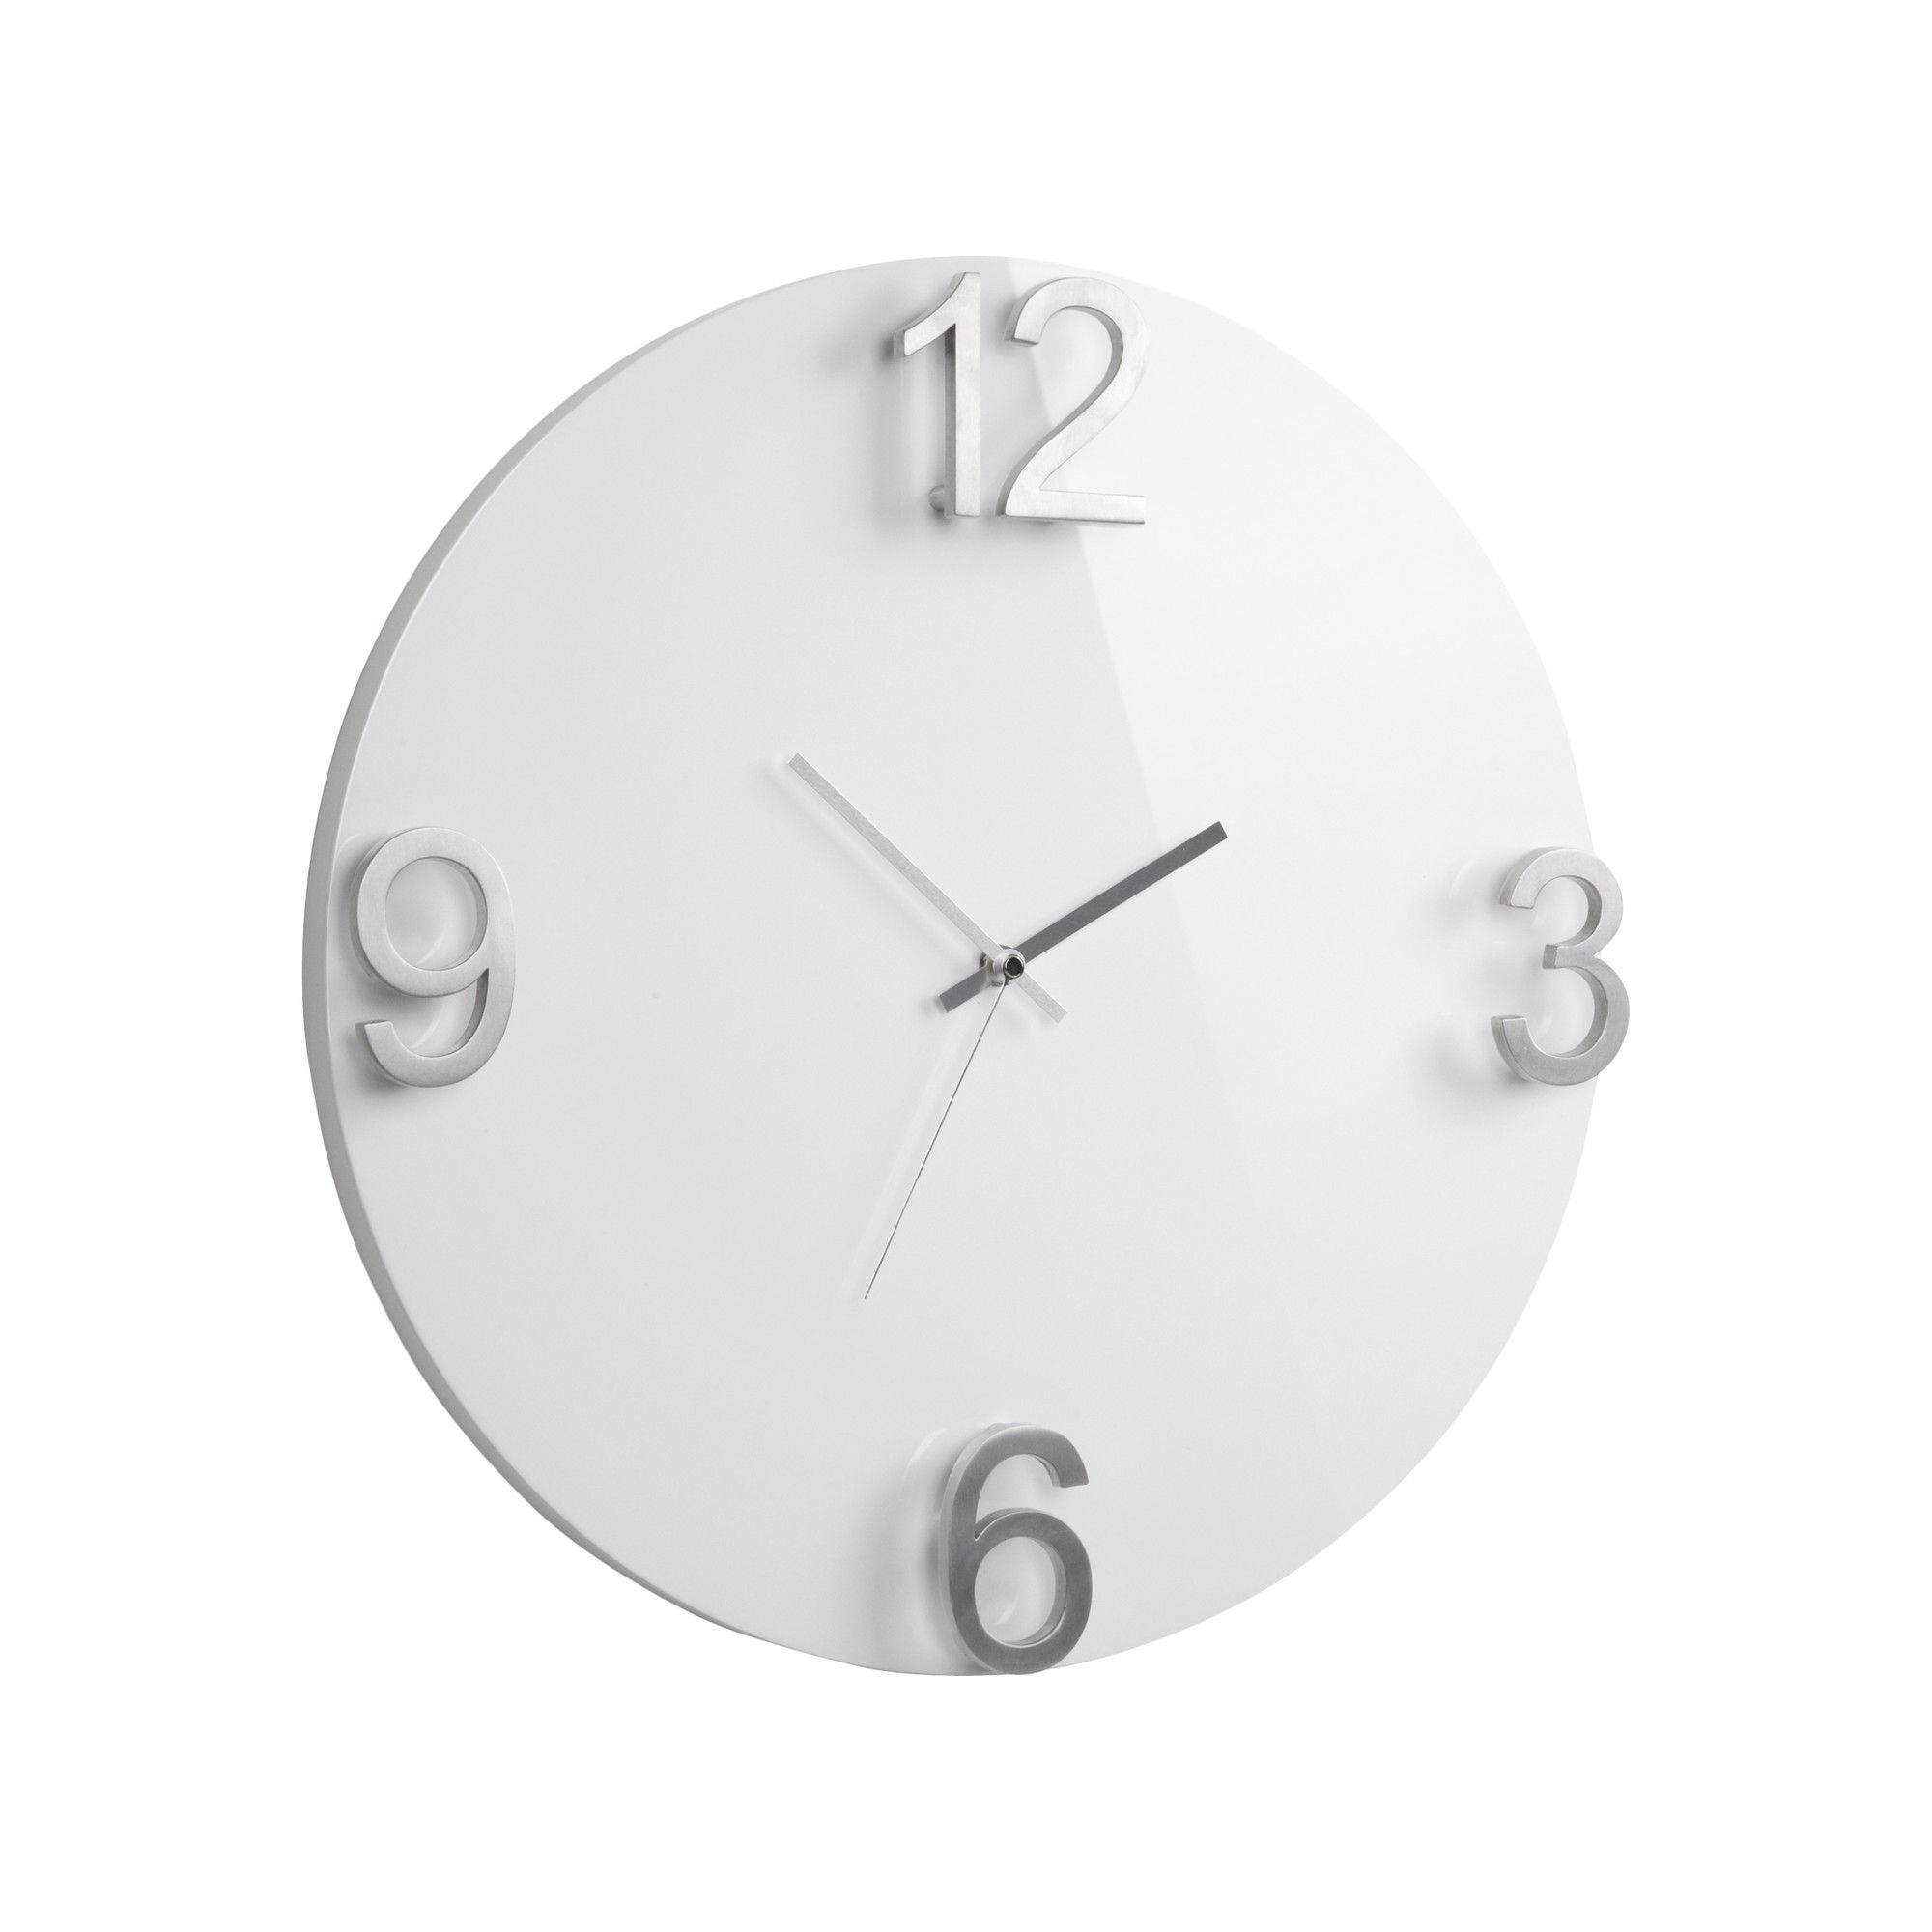 Umbra Elapse Wall Clock Reviews Wayfair